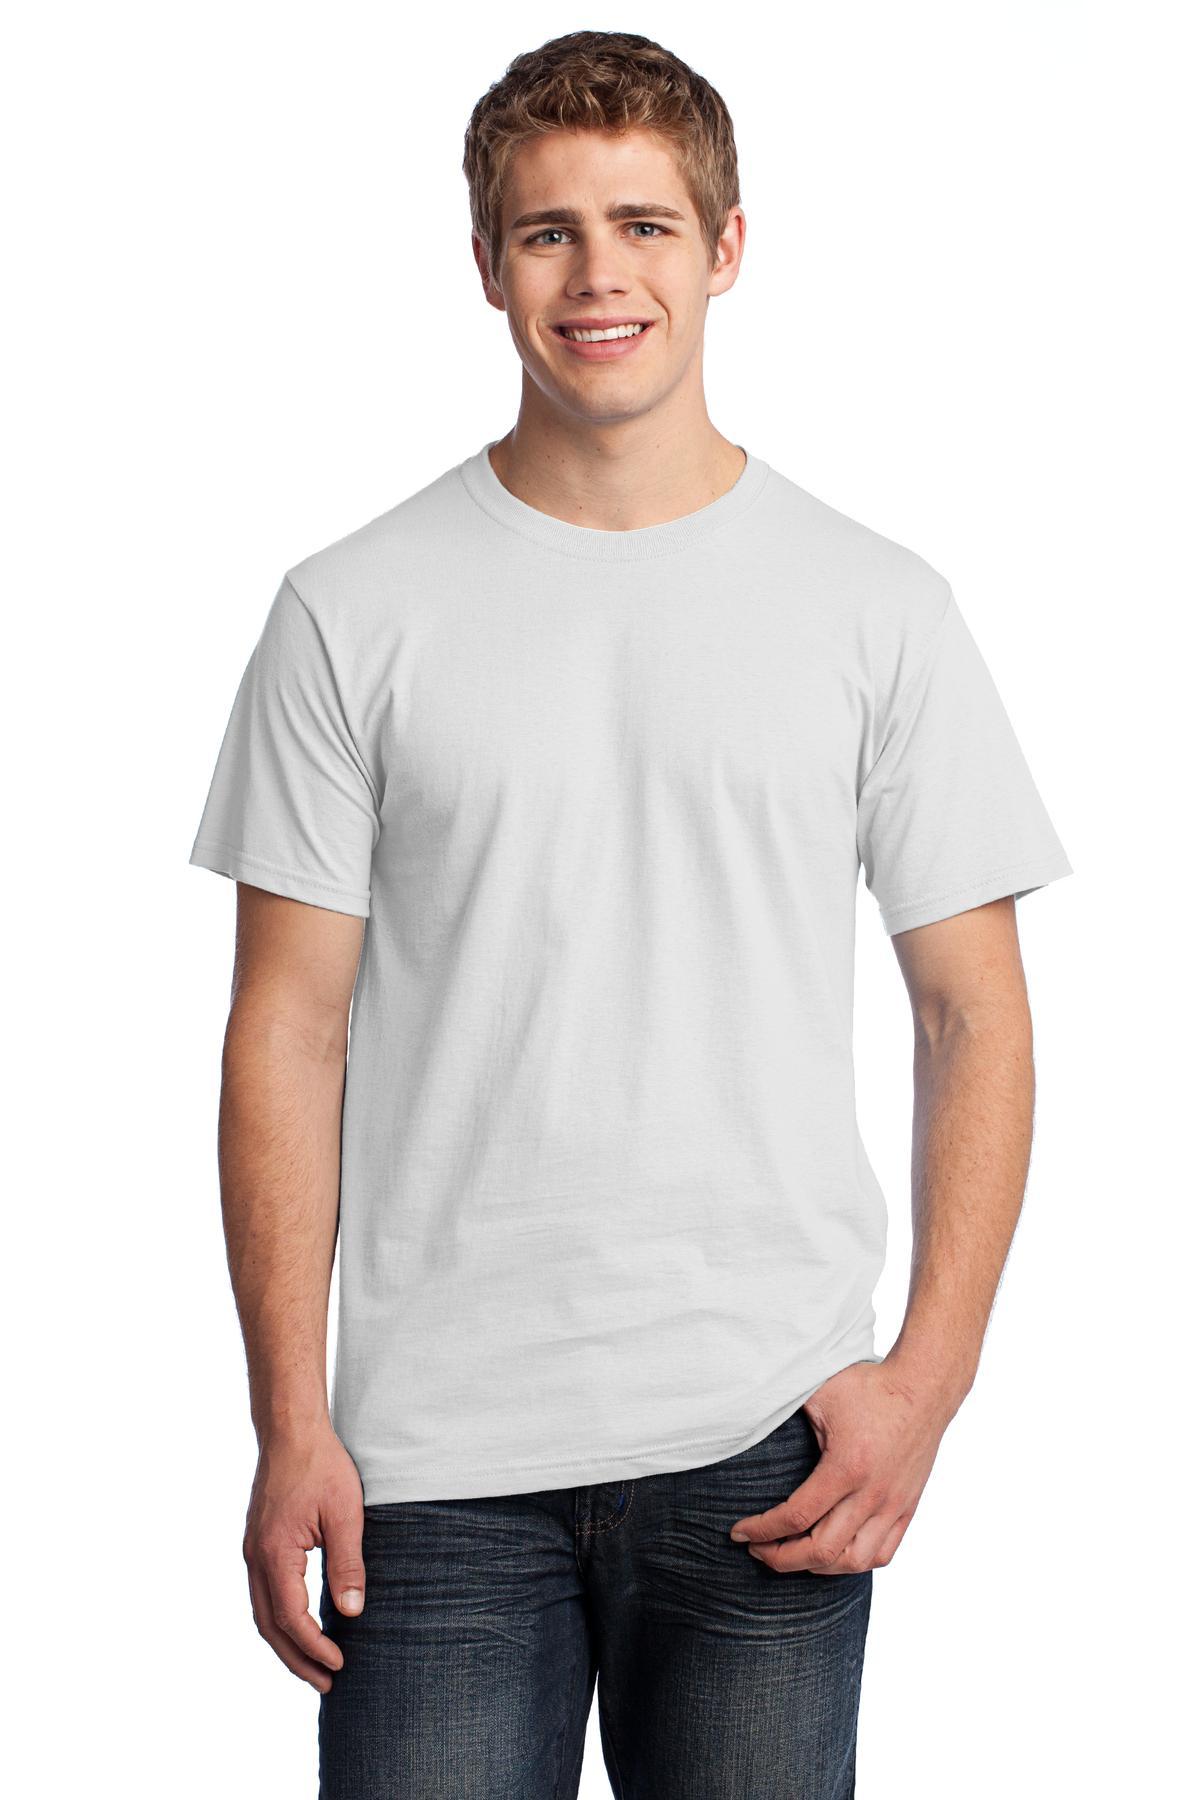 5-5.6 100% Cotton